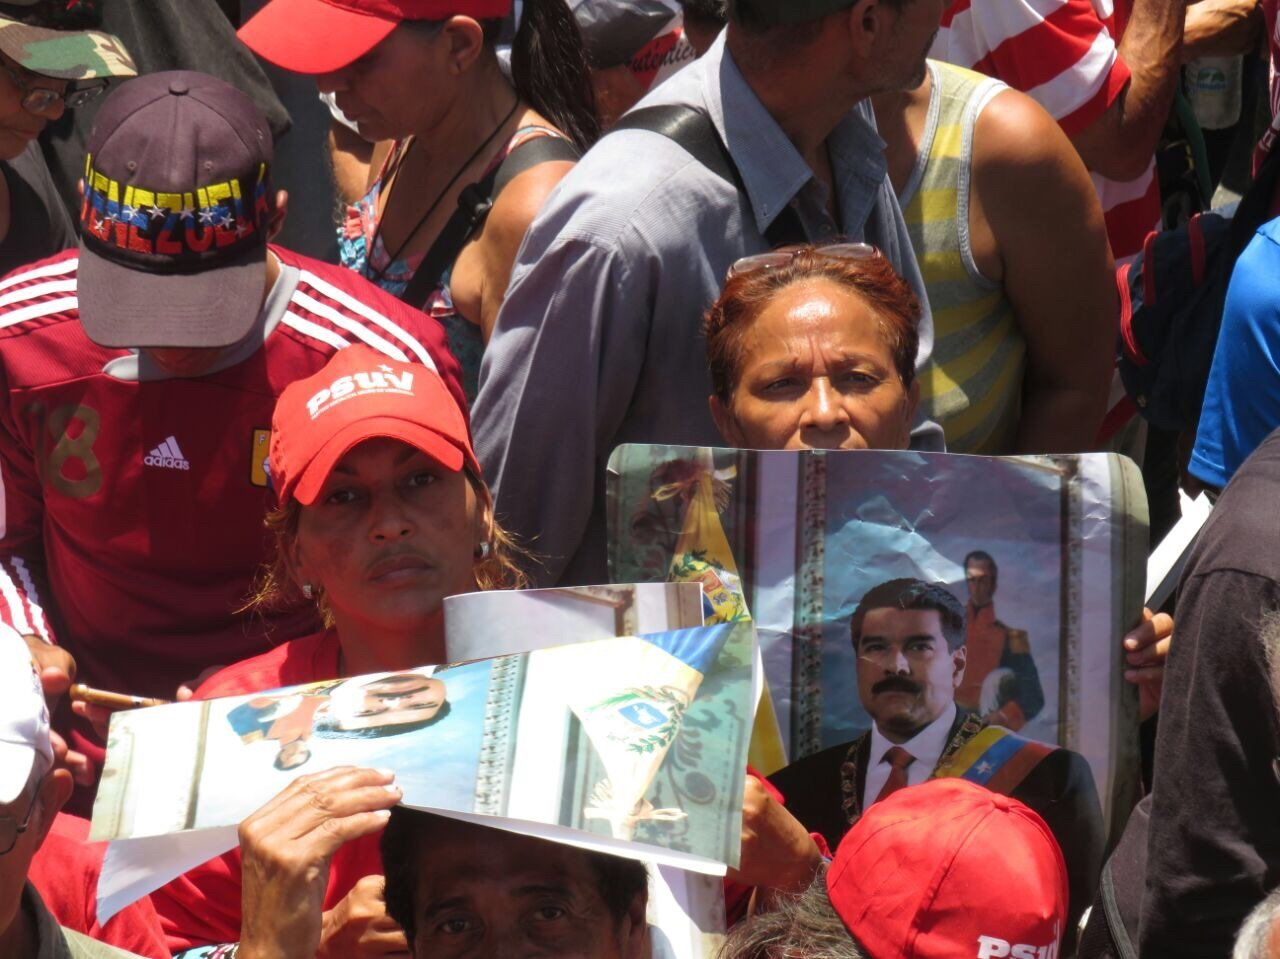 Venezuelan Scientist Offers Reality >> What Actual Venezuelans Think About The Ongoing Venezuelan Crisis